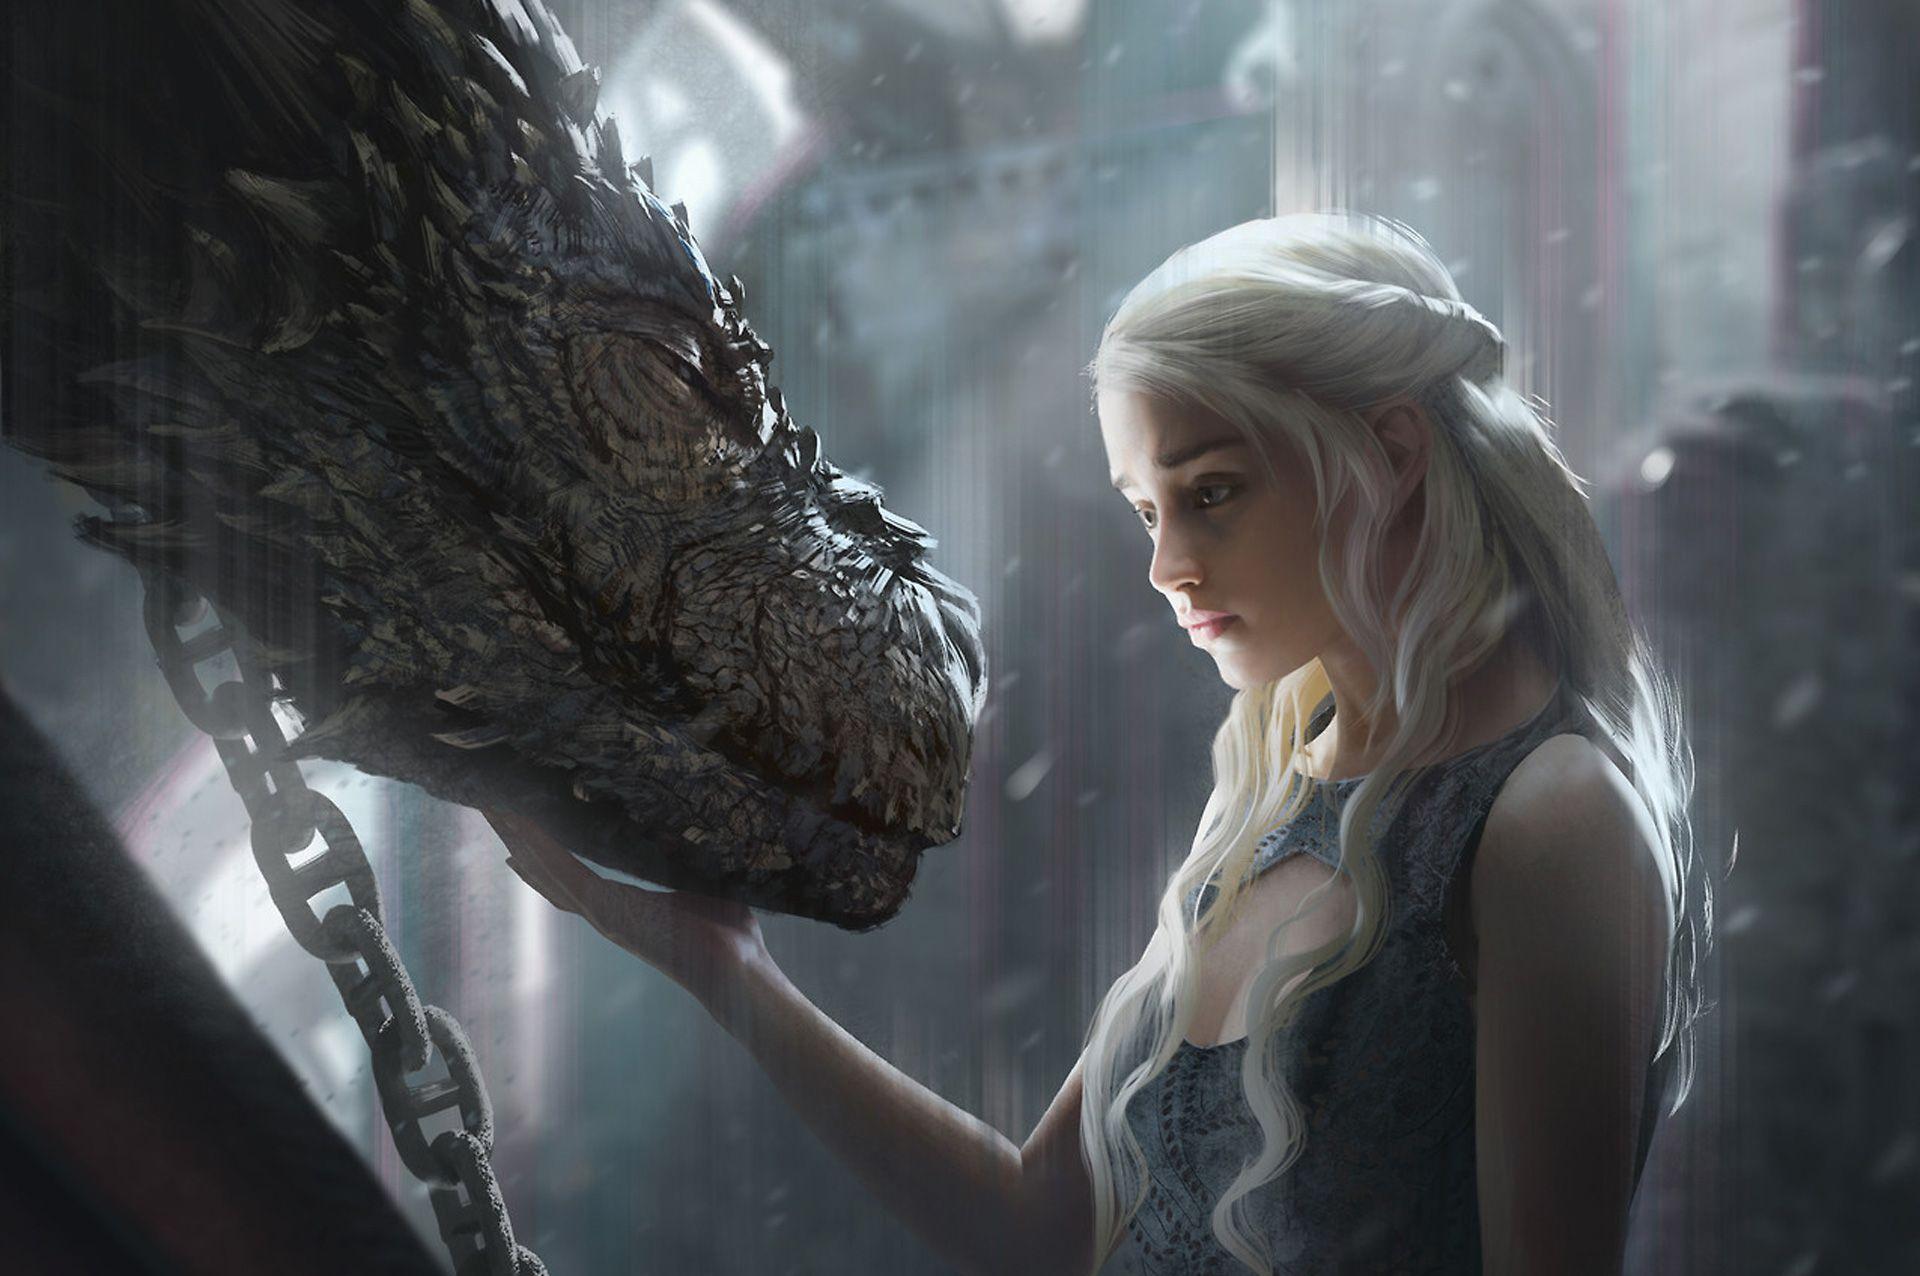 Game of Thrones Daenerys wallpaper